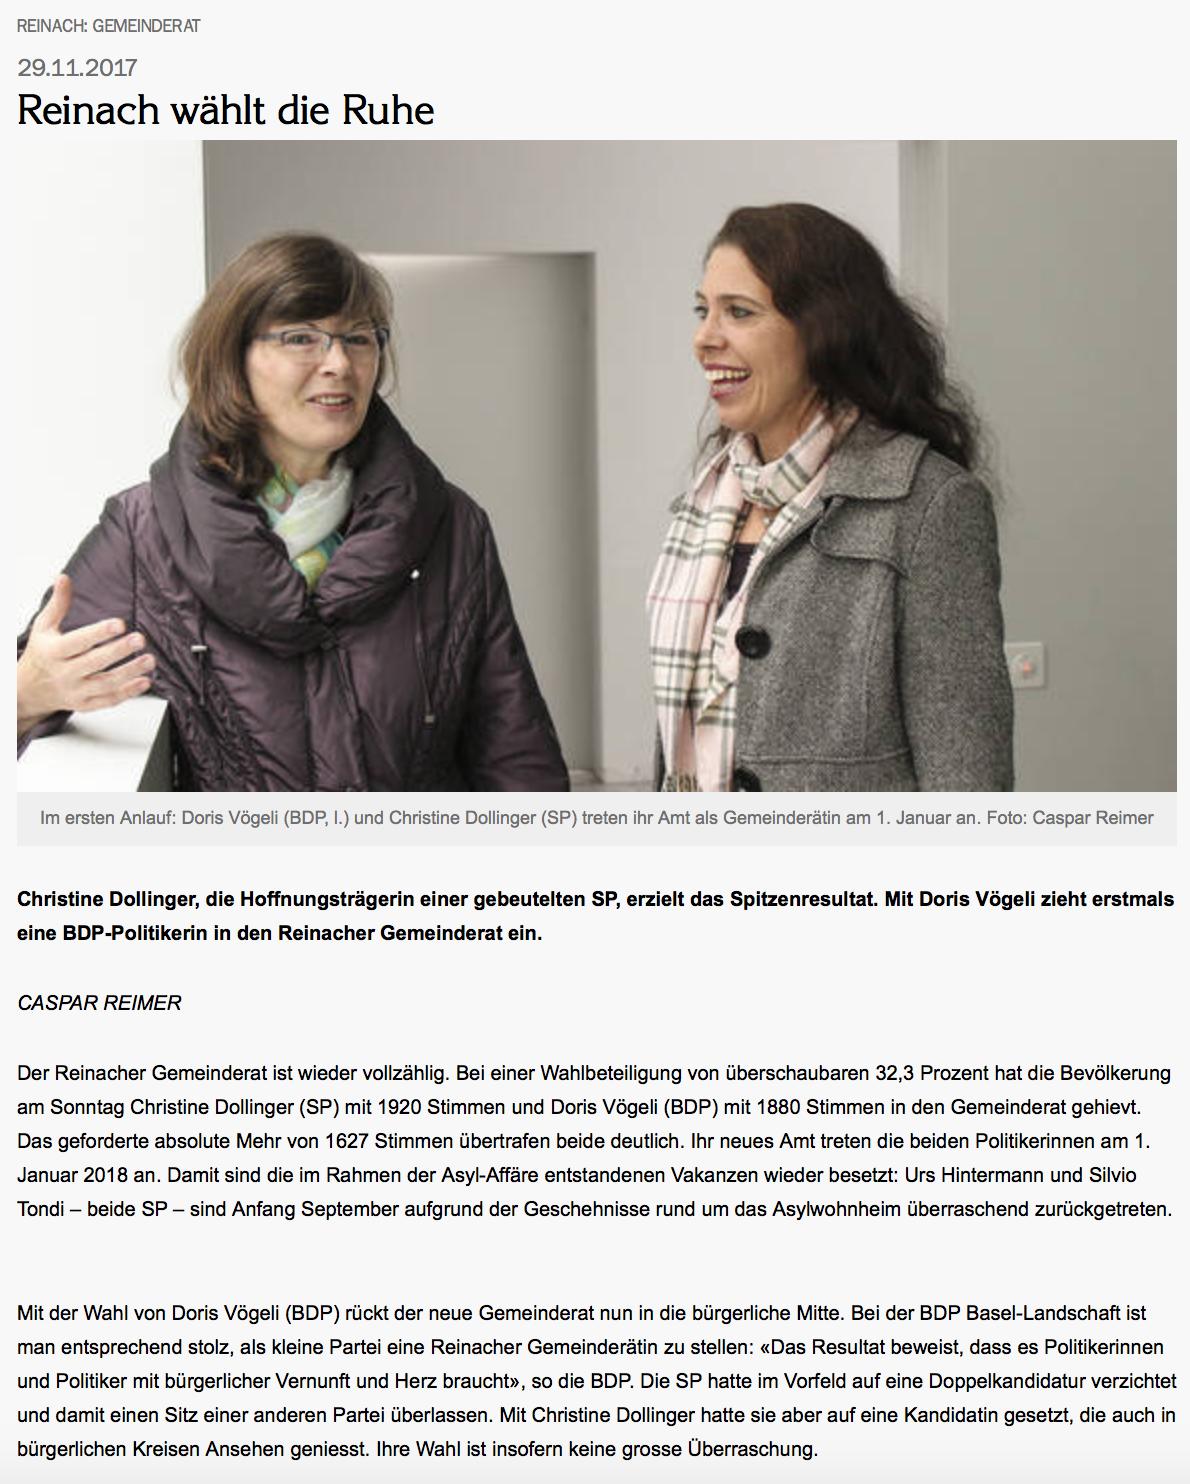 29.11.2017 Wochenblatt